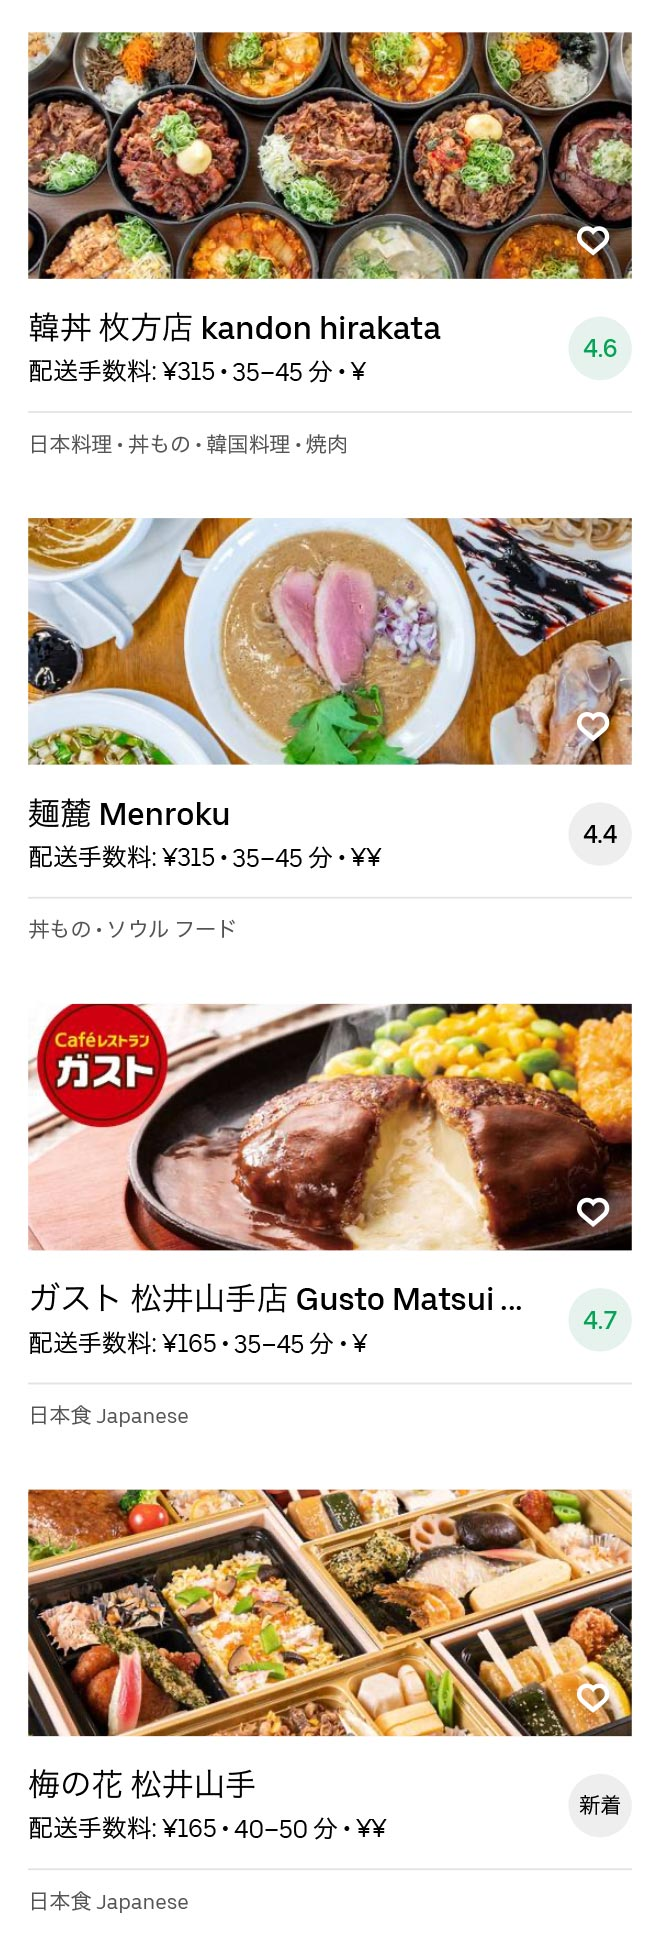 Nagao menu 2010 06